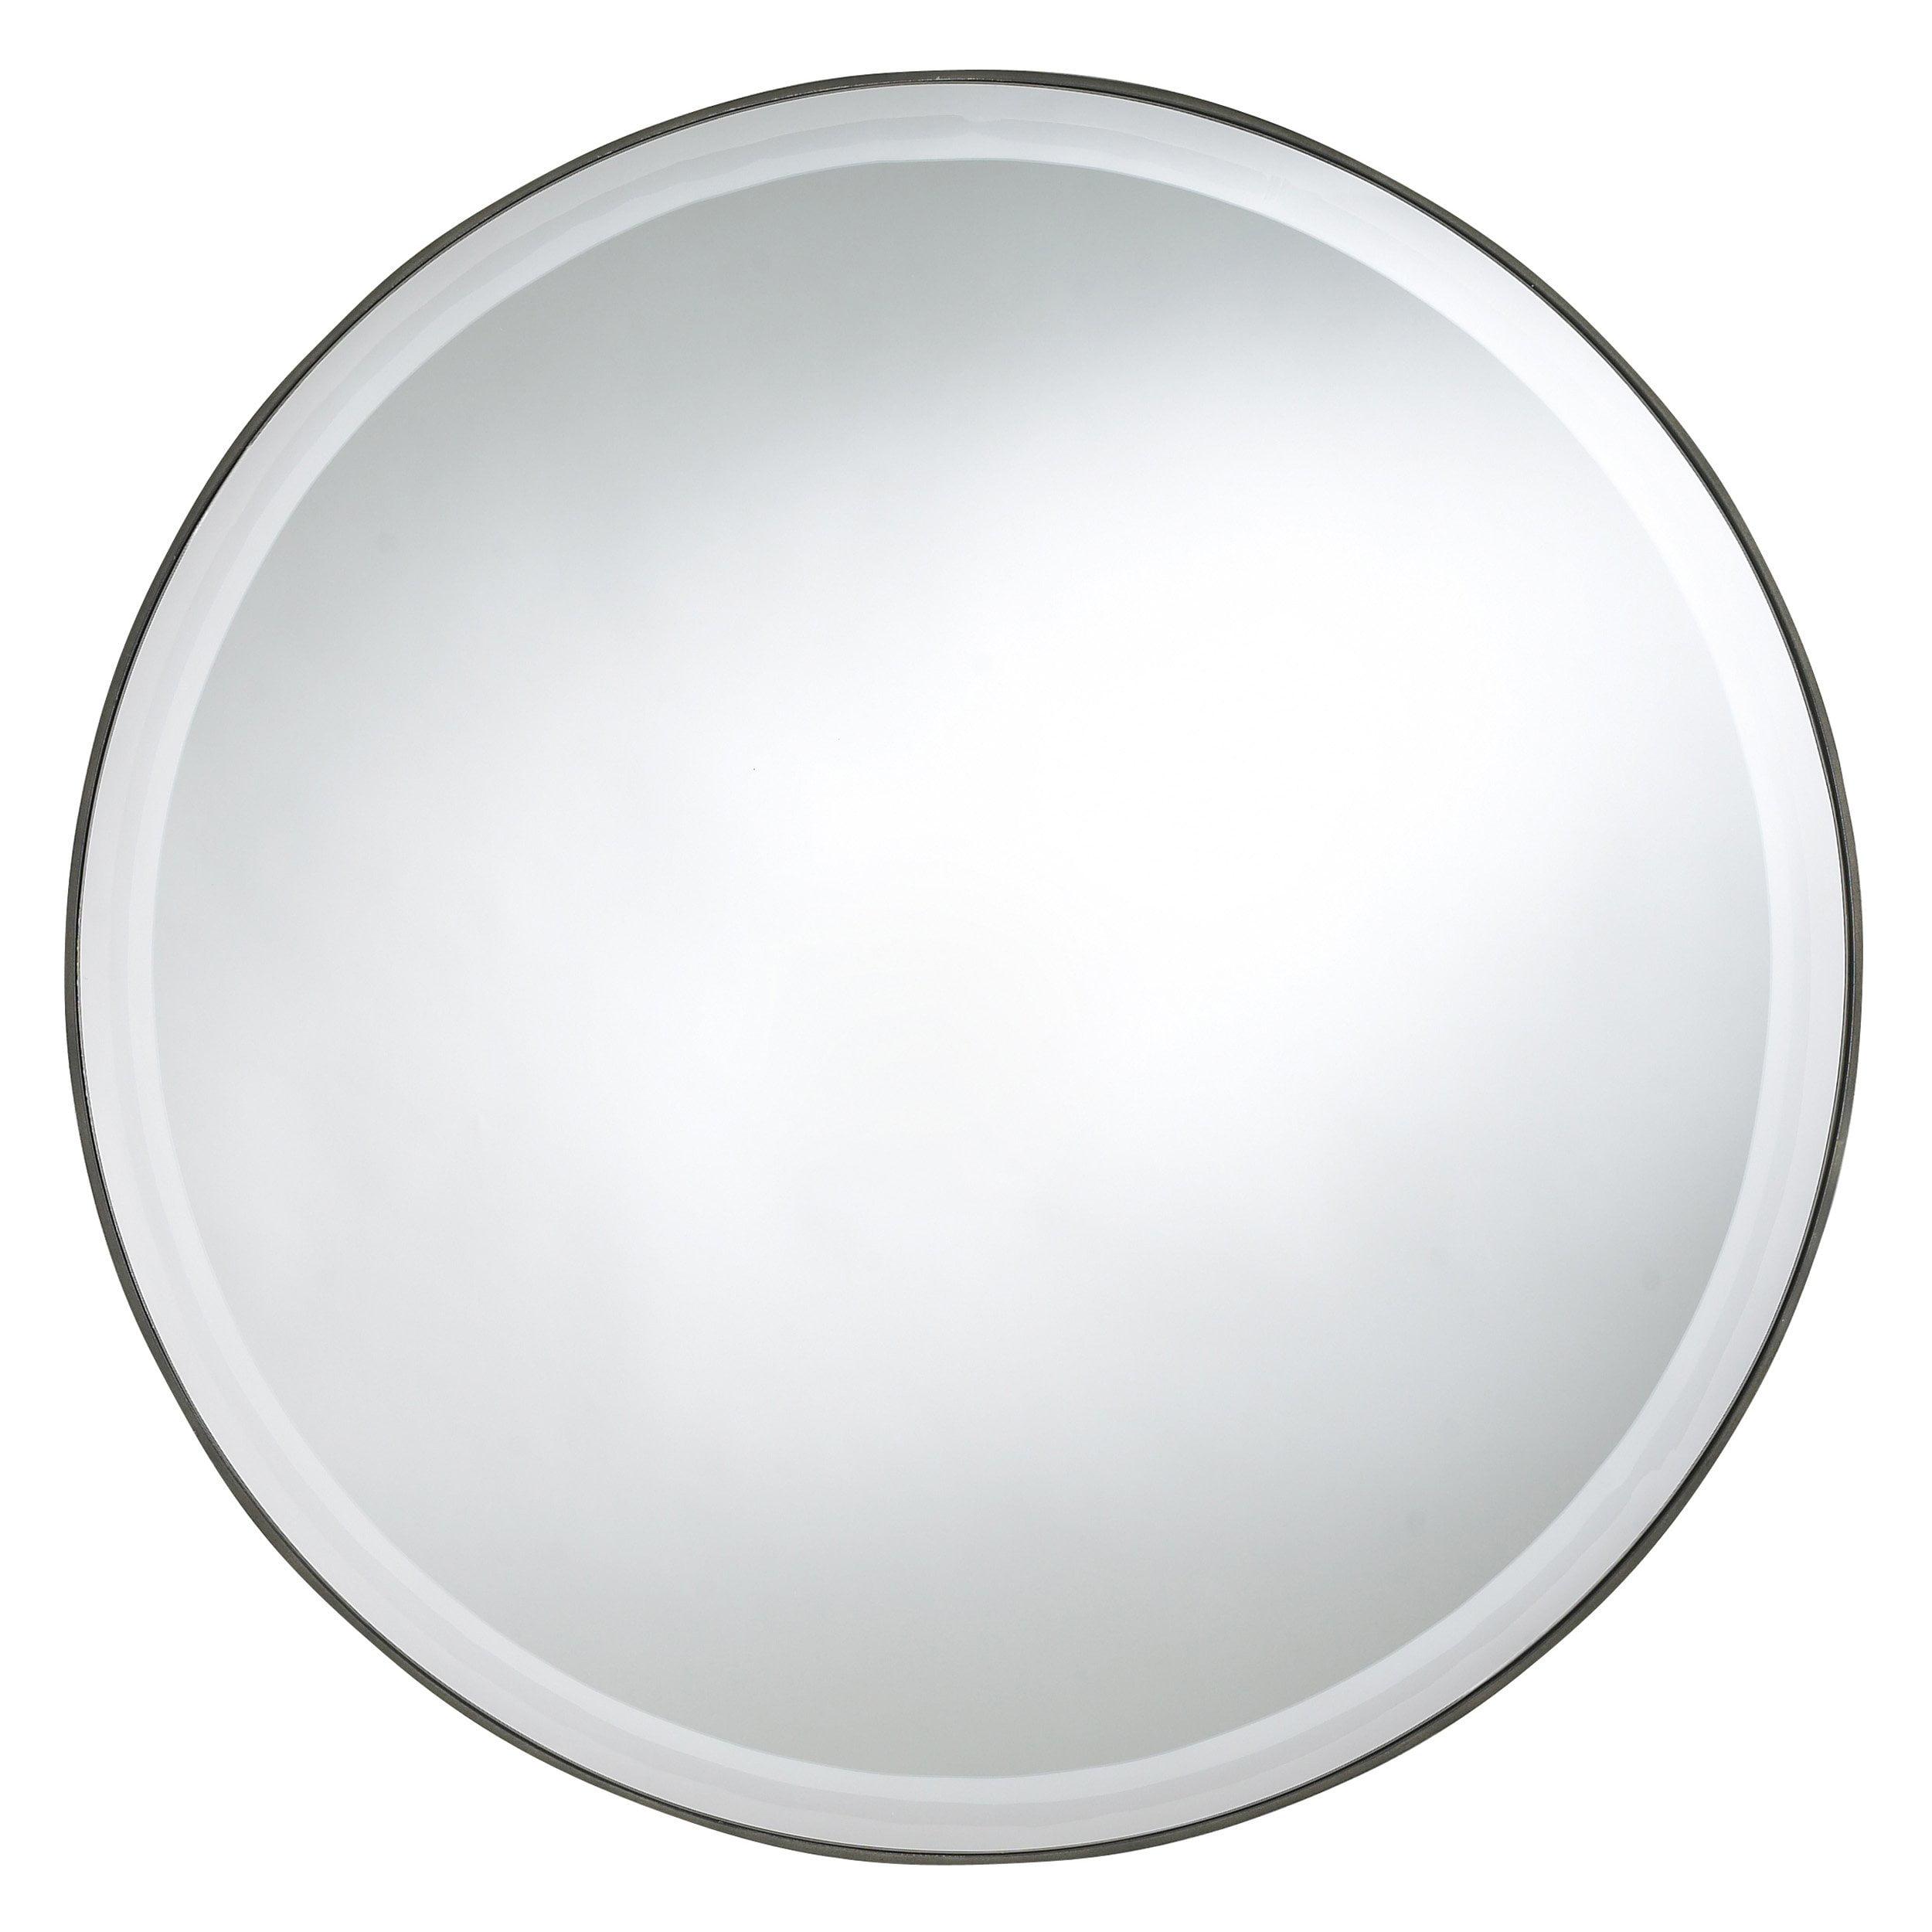 Cooper Classics Seymour Round Mirror 29 diam.in. by Cooper Classics